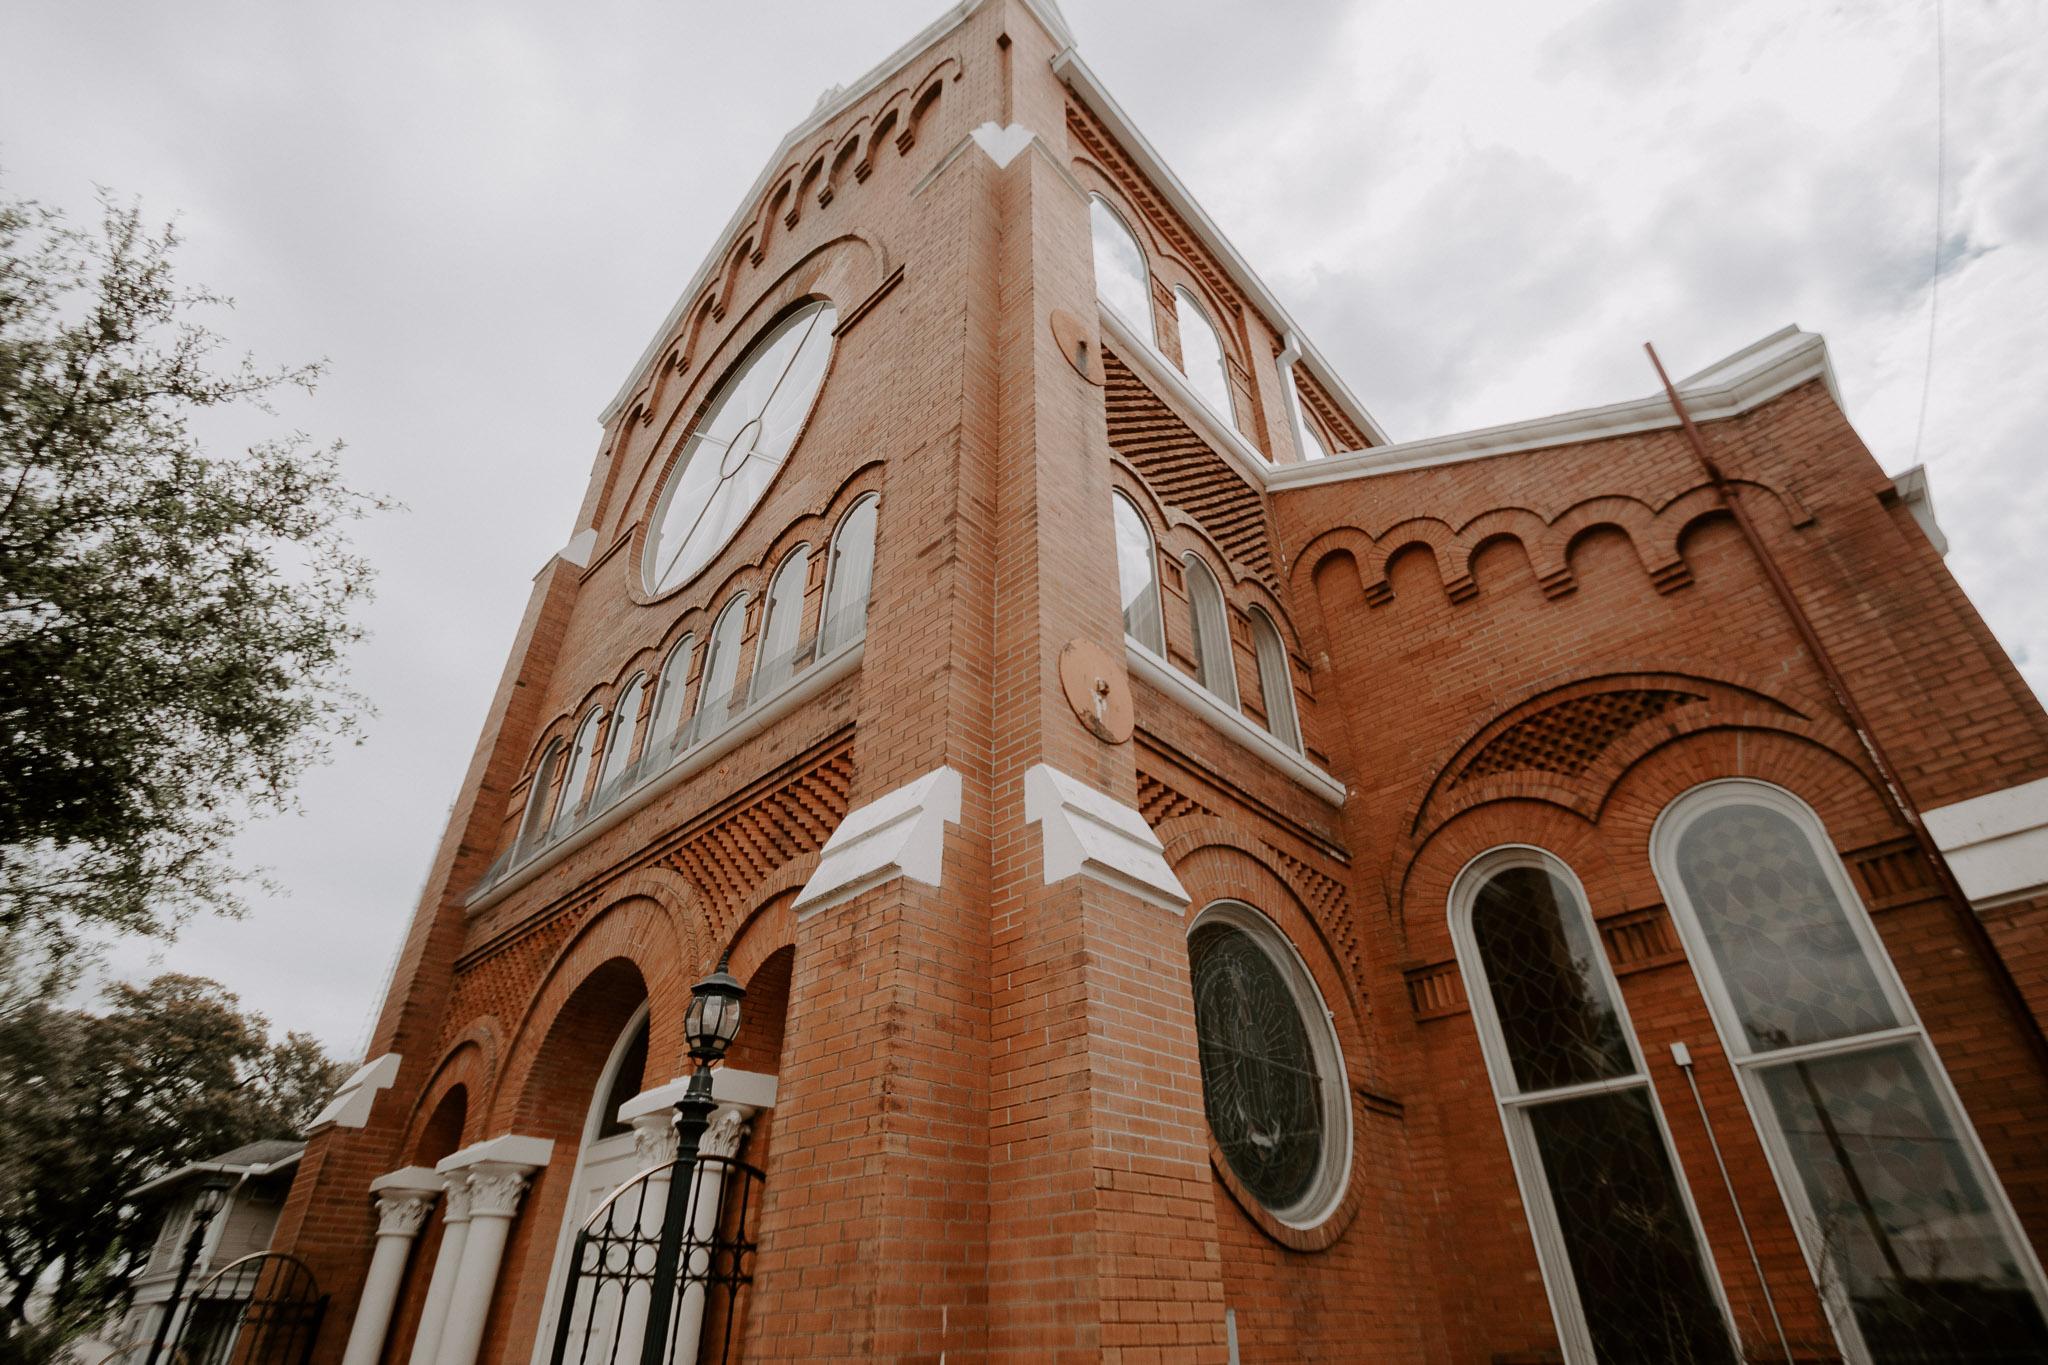 Catholic Houston Texas Flare Wedding Bell Tower-1480.jpg